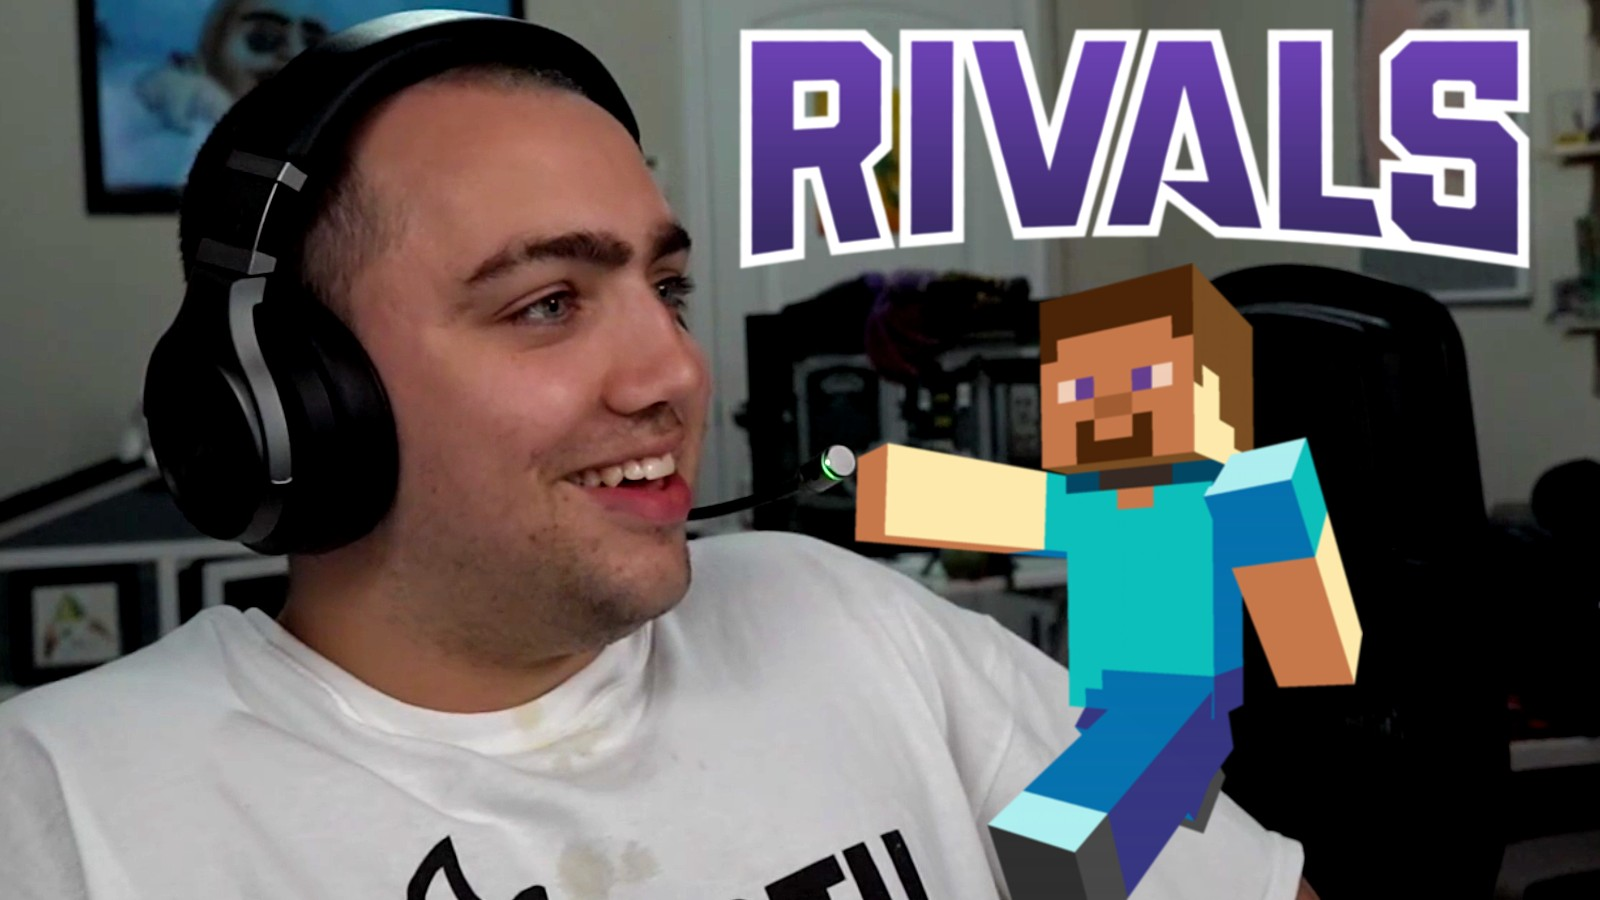 Mizkif next to the Twitch rivals logo and Minecraft's Steve